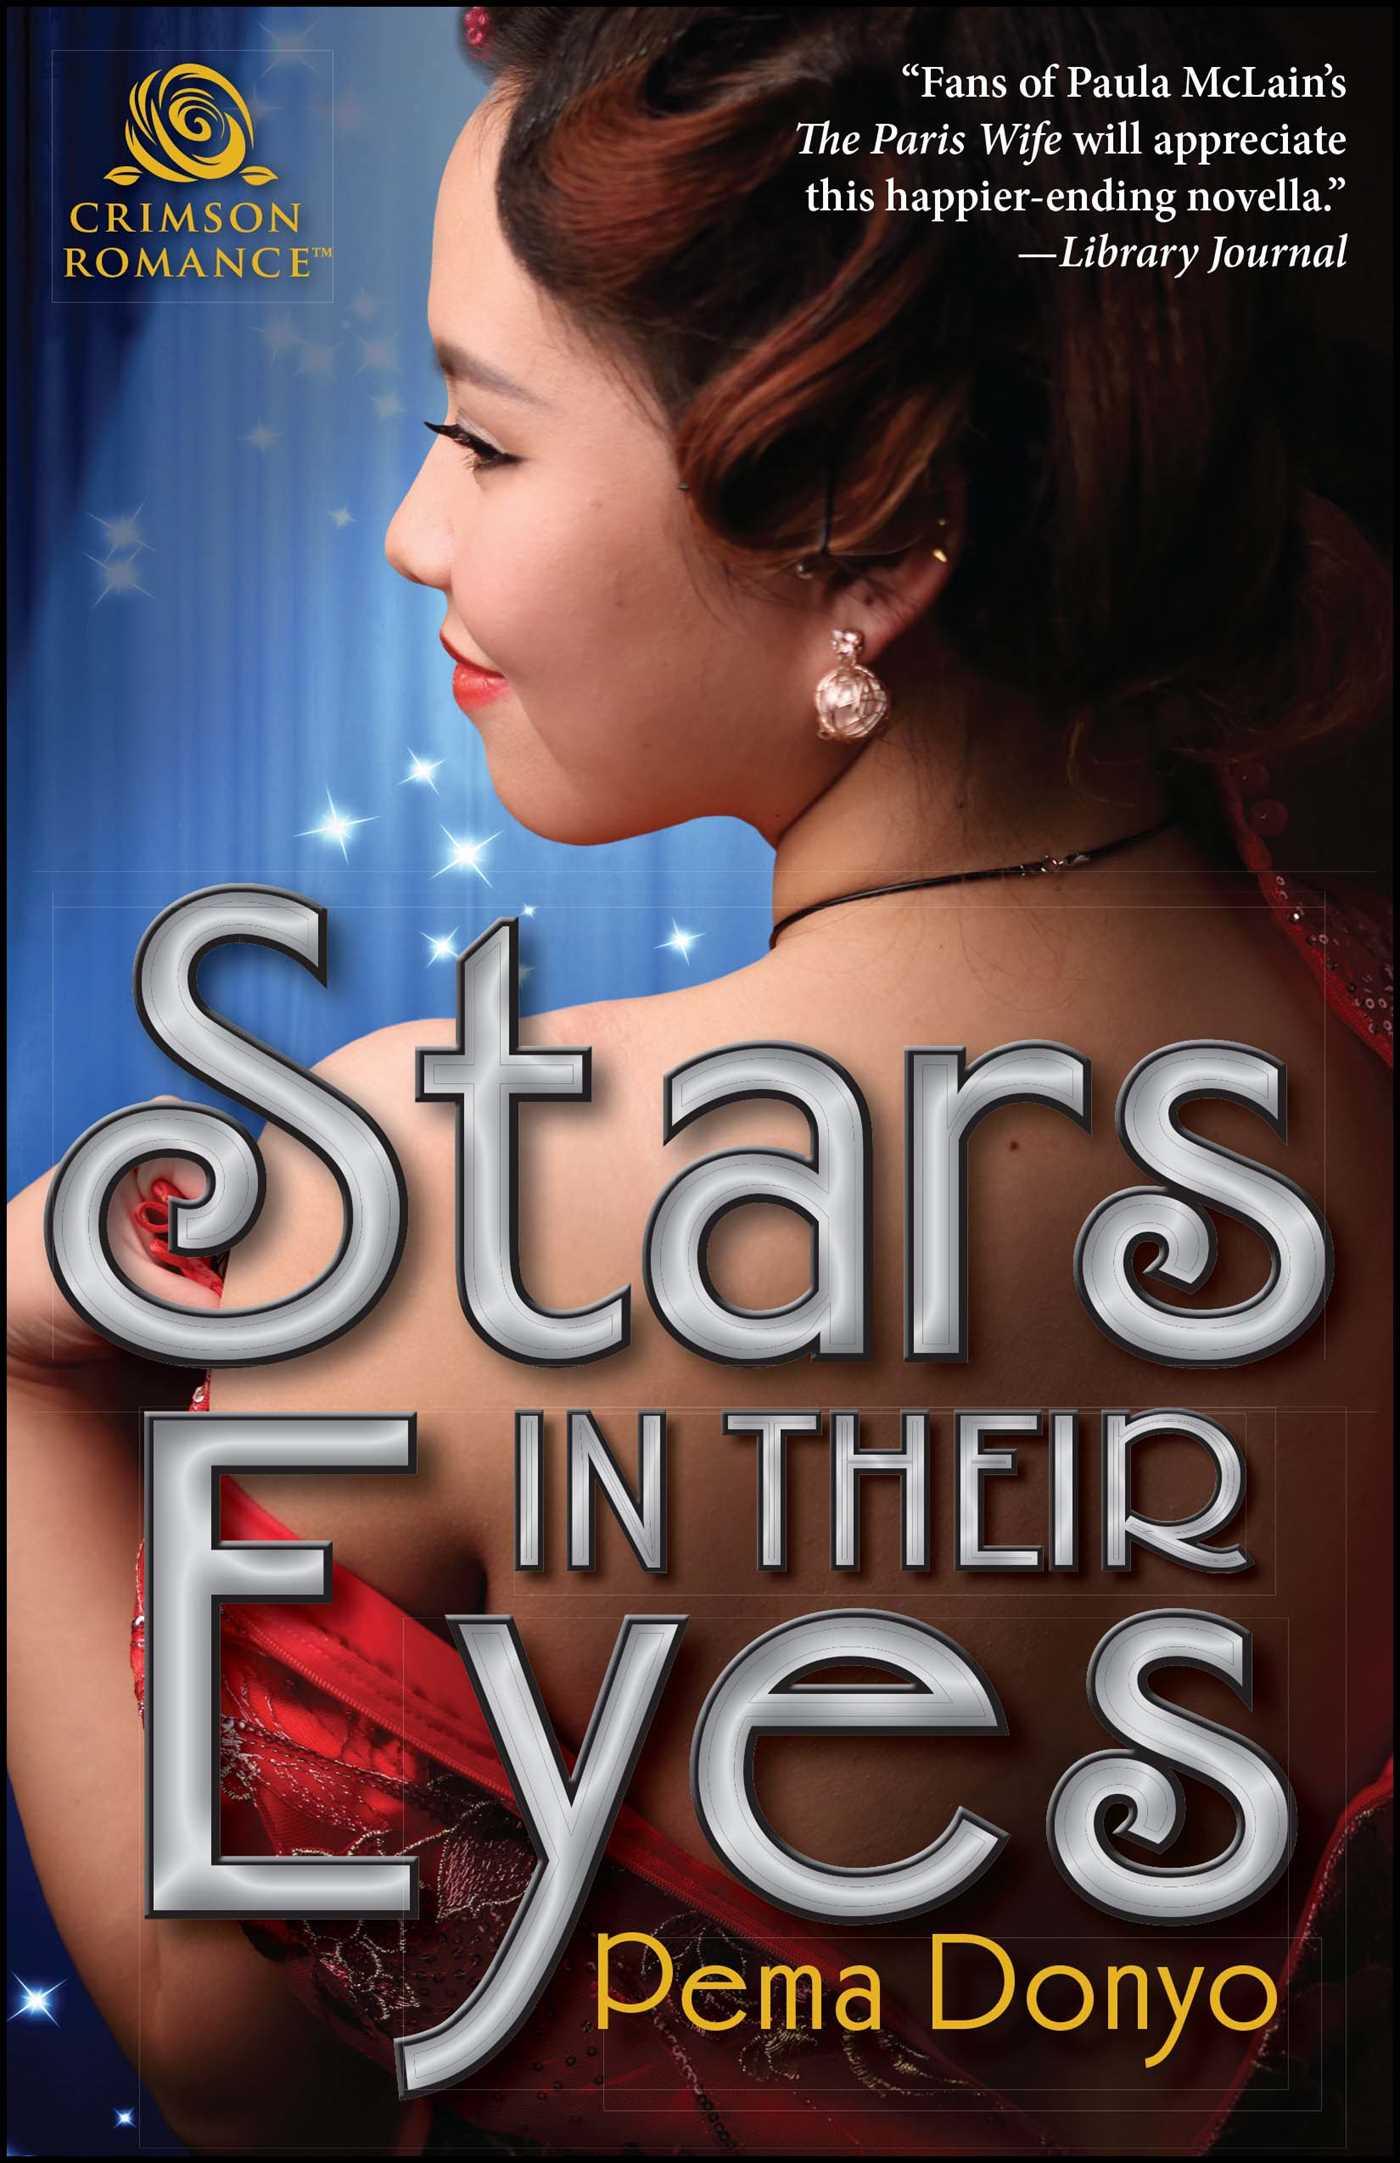 Stars in their eyes 9781507206461 hr